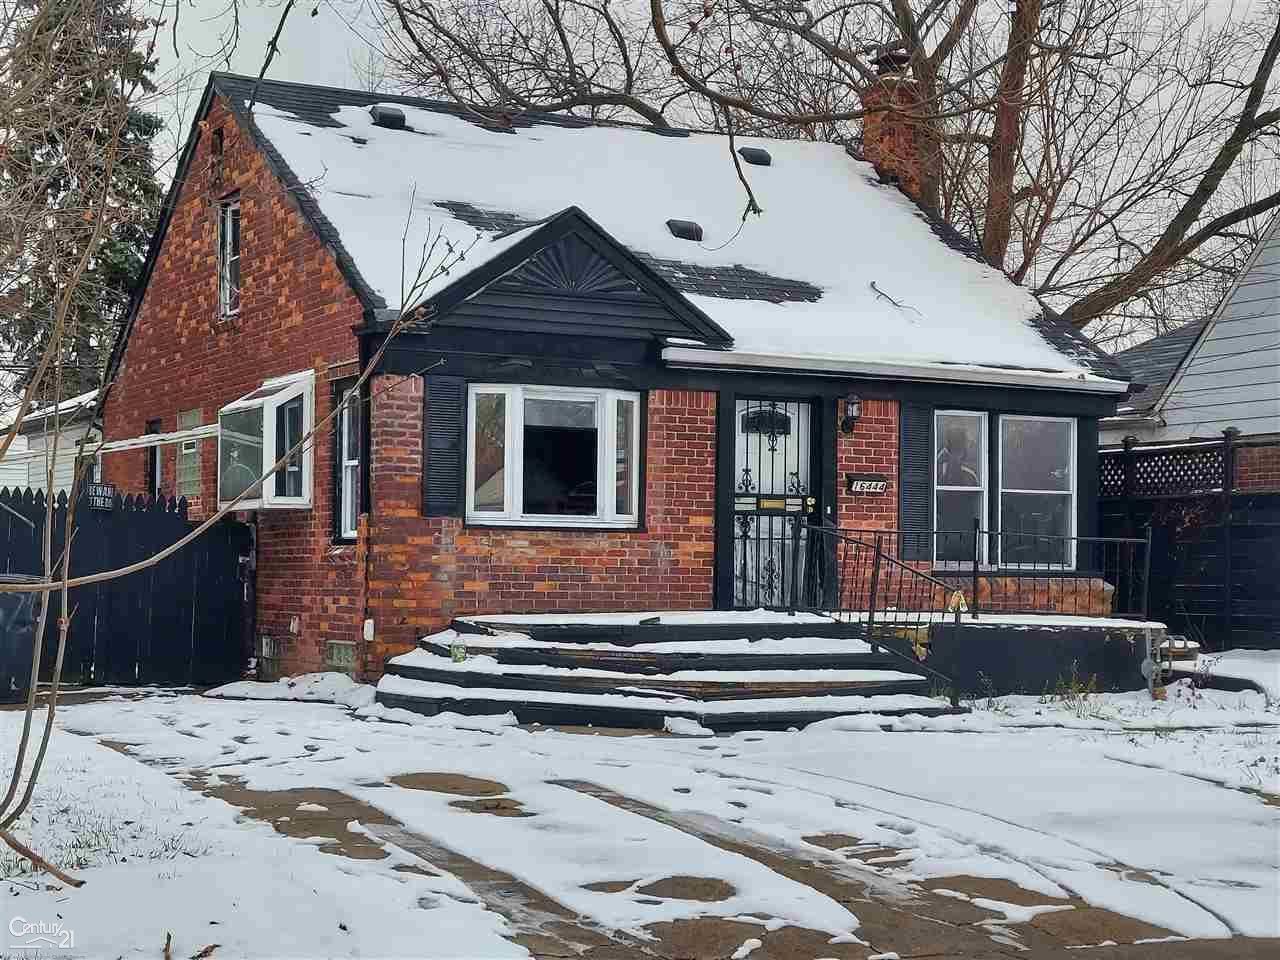 16444 Edmore, Detroit, MI 48205 - MLS#: 50032138